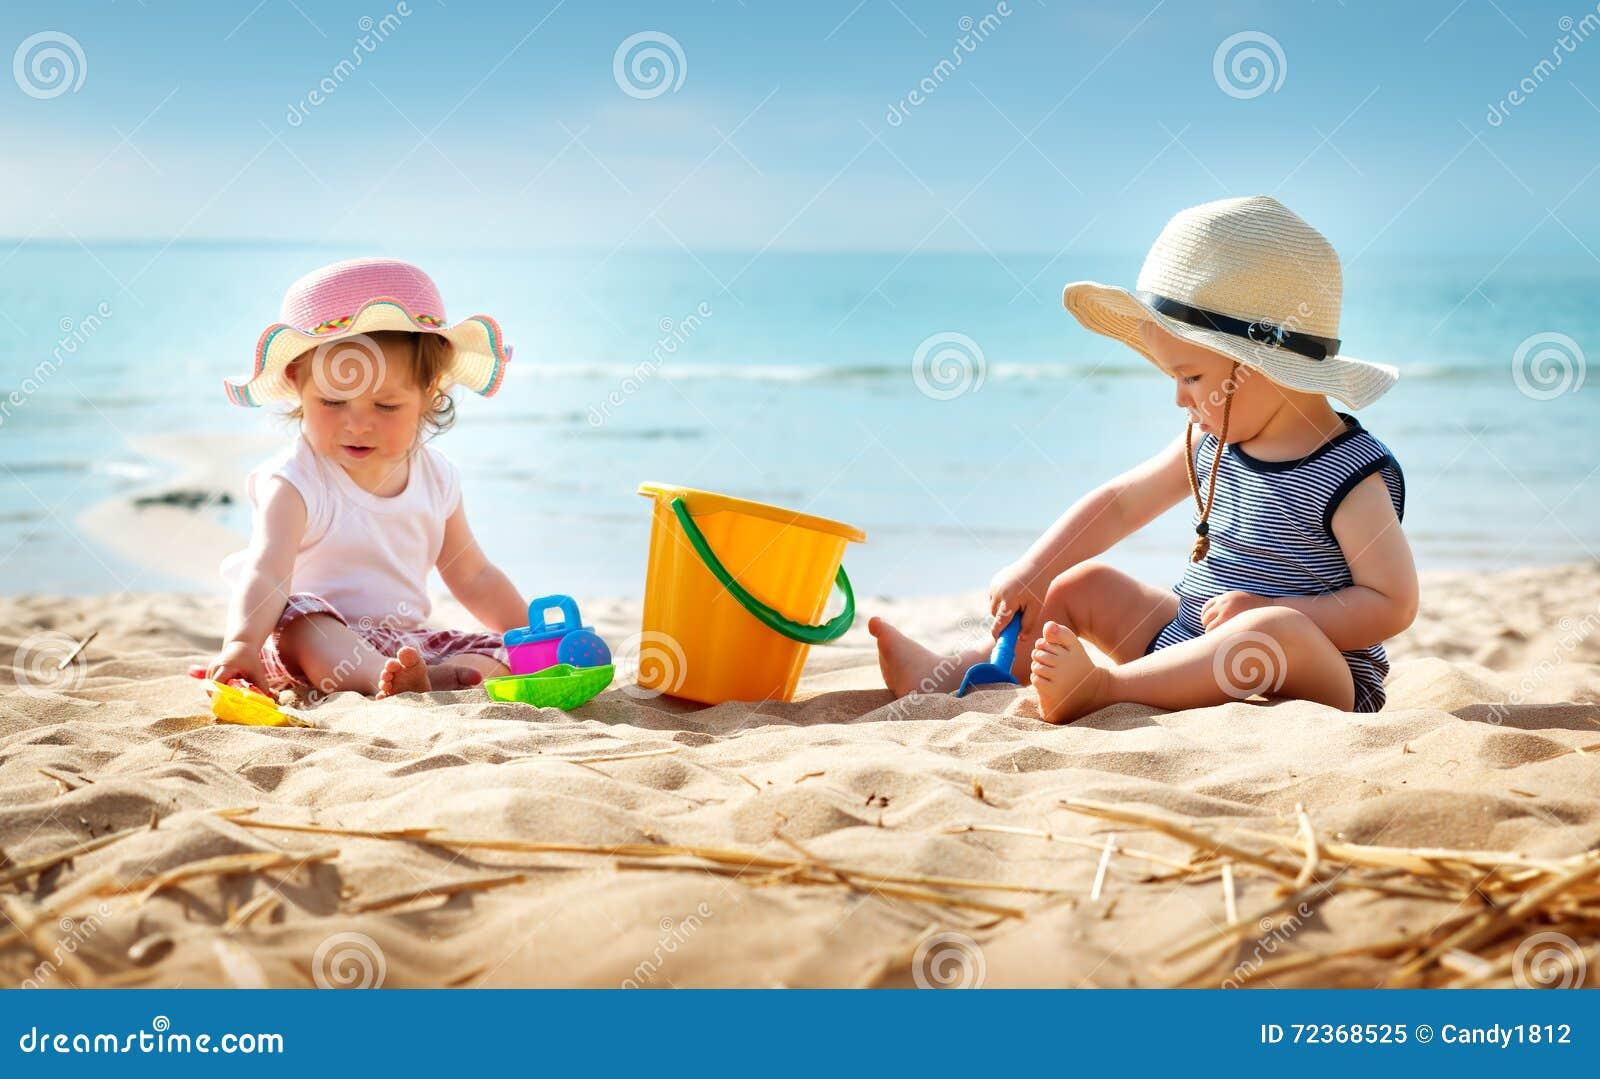 Babygirl和babyboy开会在海滩